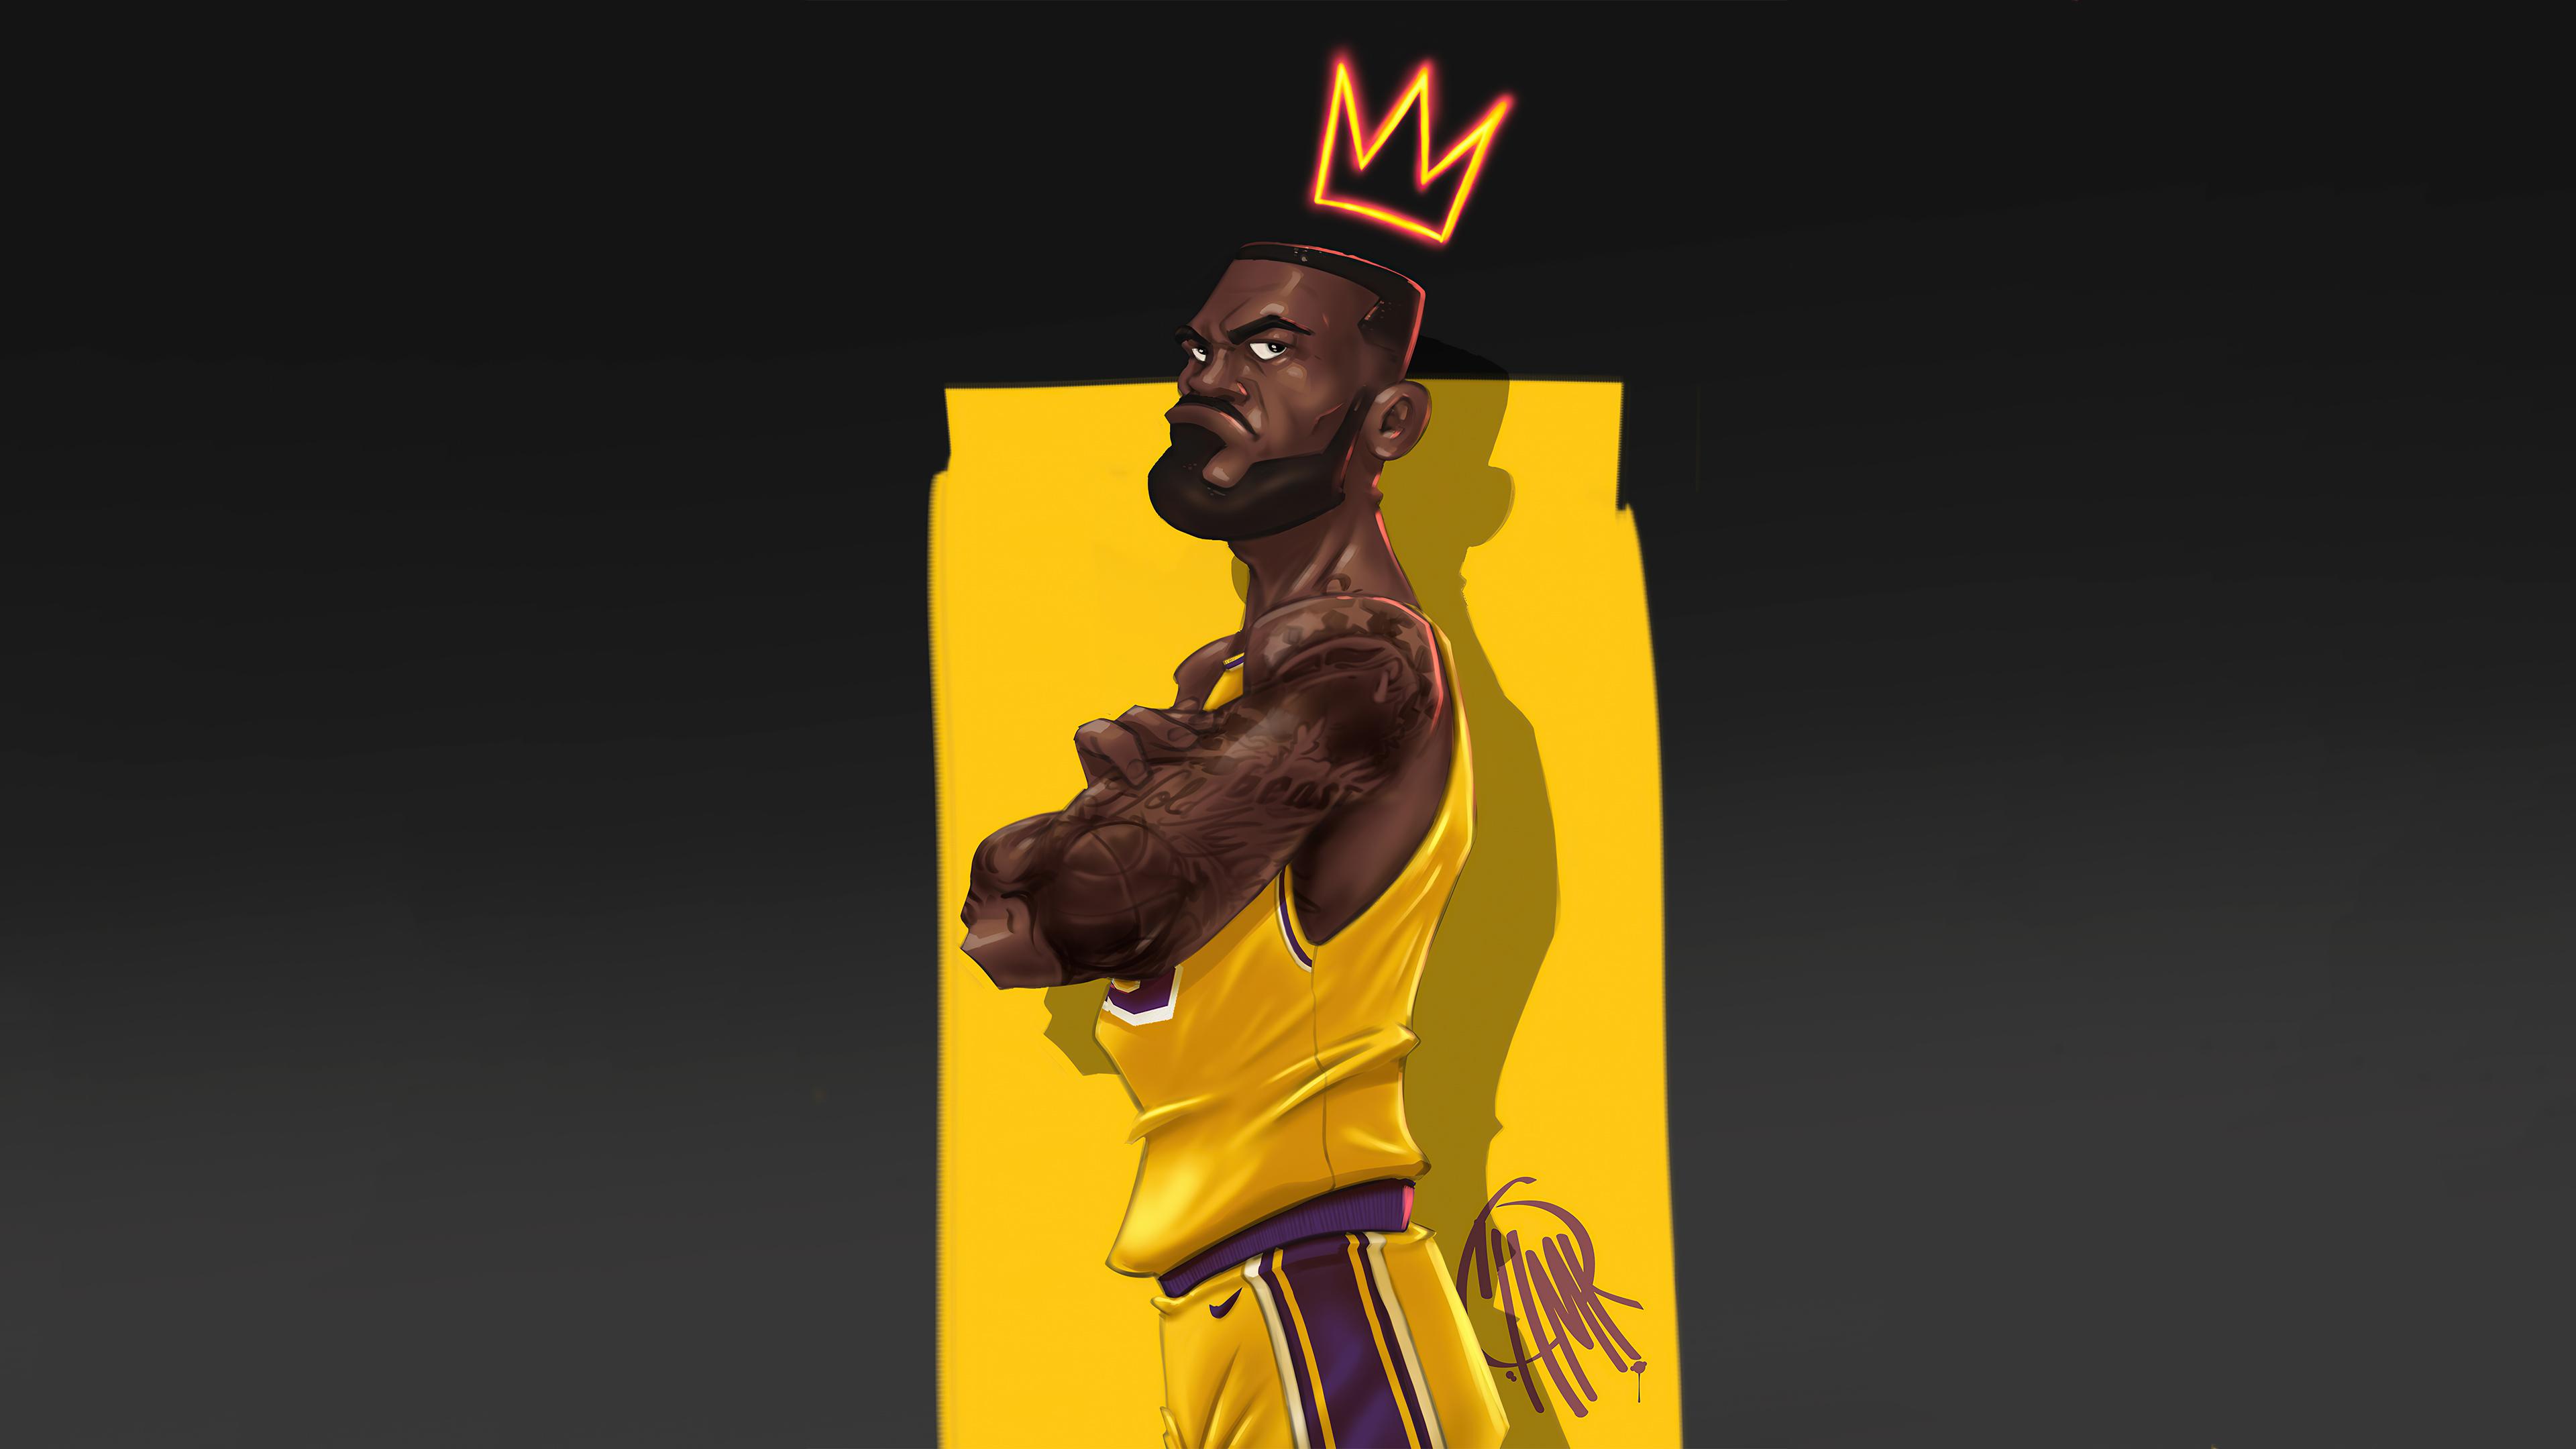 king james 4k 1604346985 - King James 4k - King James 4k wallpapers